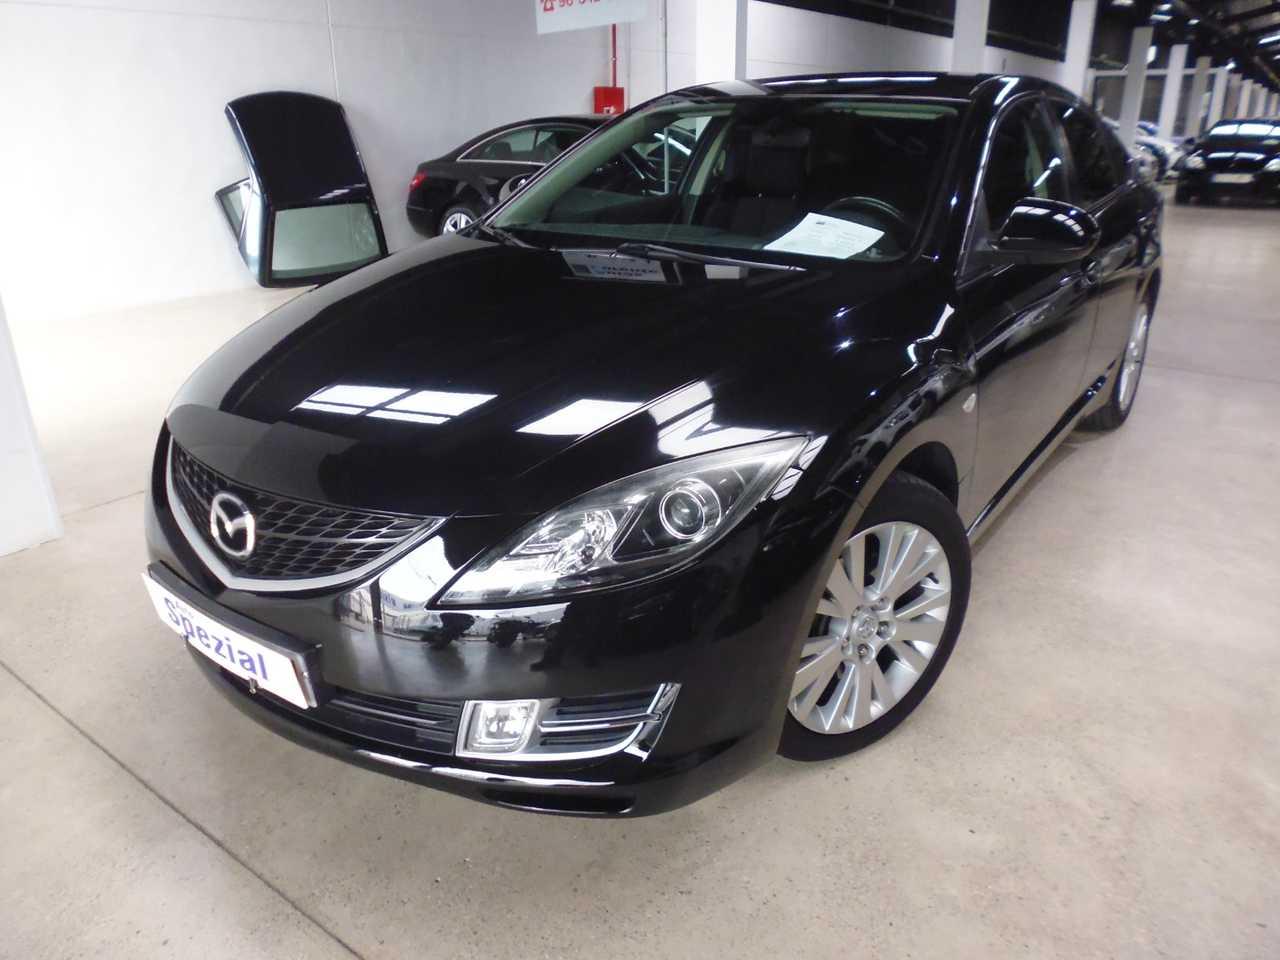 Mazda 6 2.2 DE 120 Cv Diesel   - Foto 1